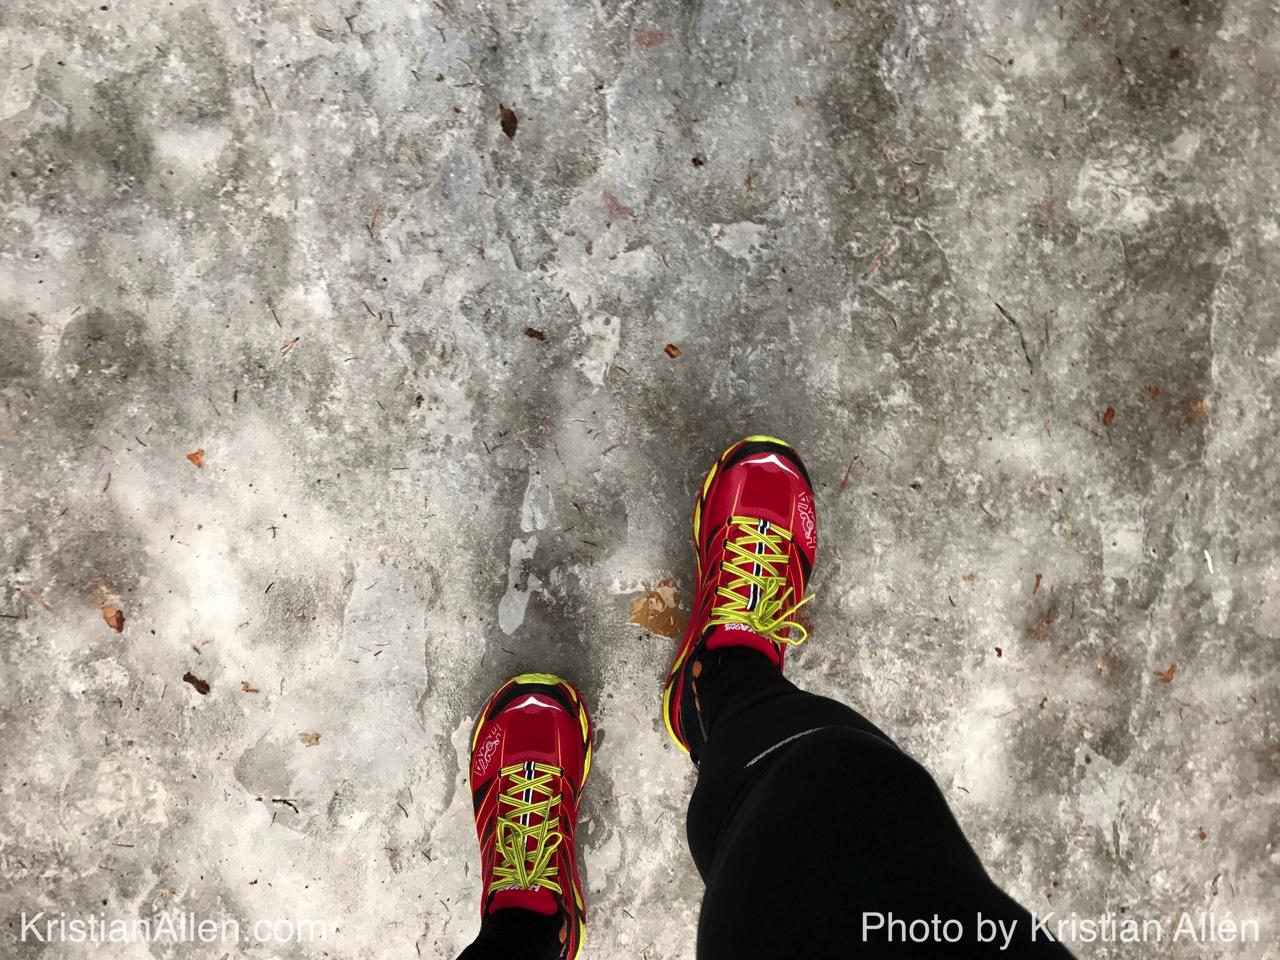 15.3.2017 15.14 km Run